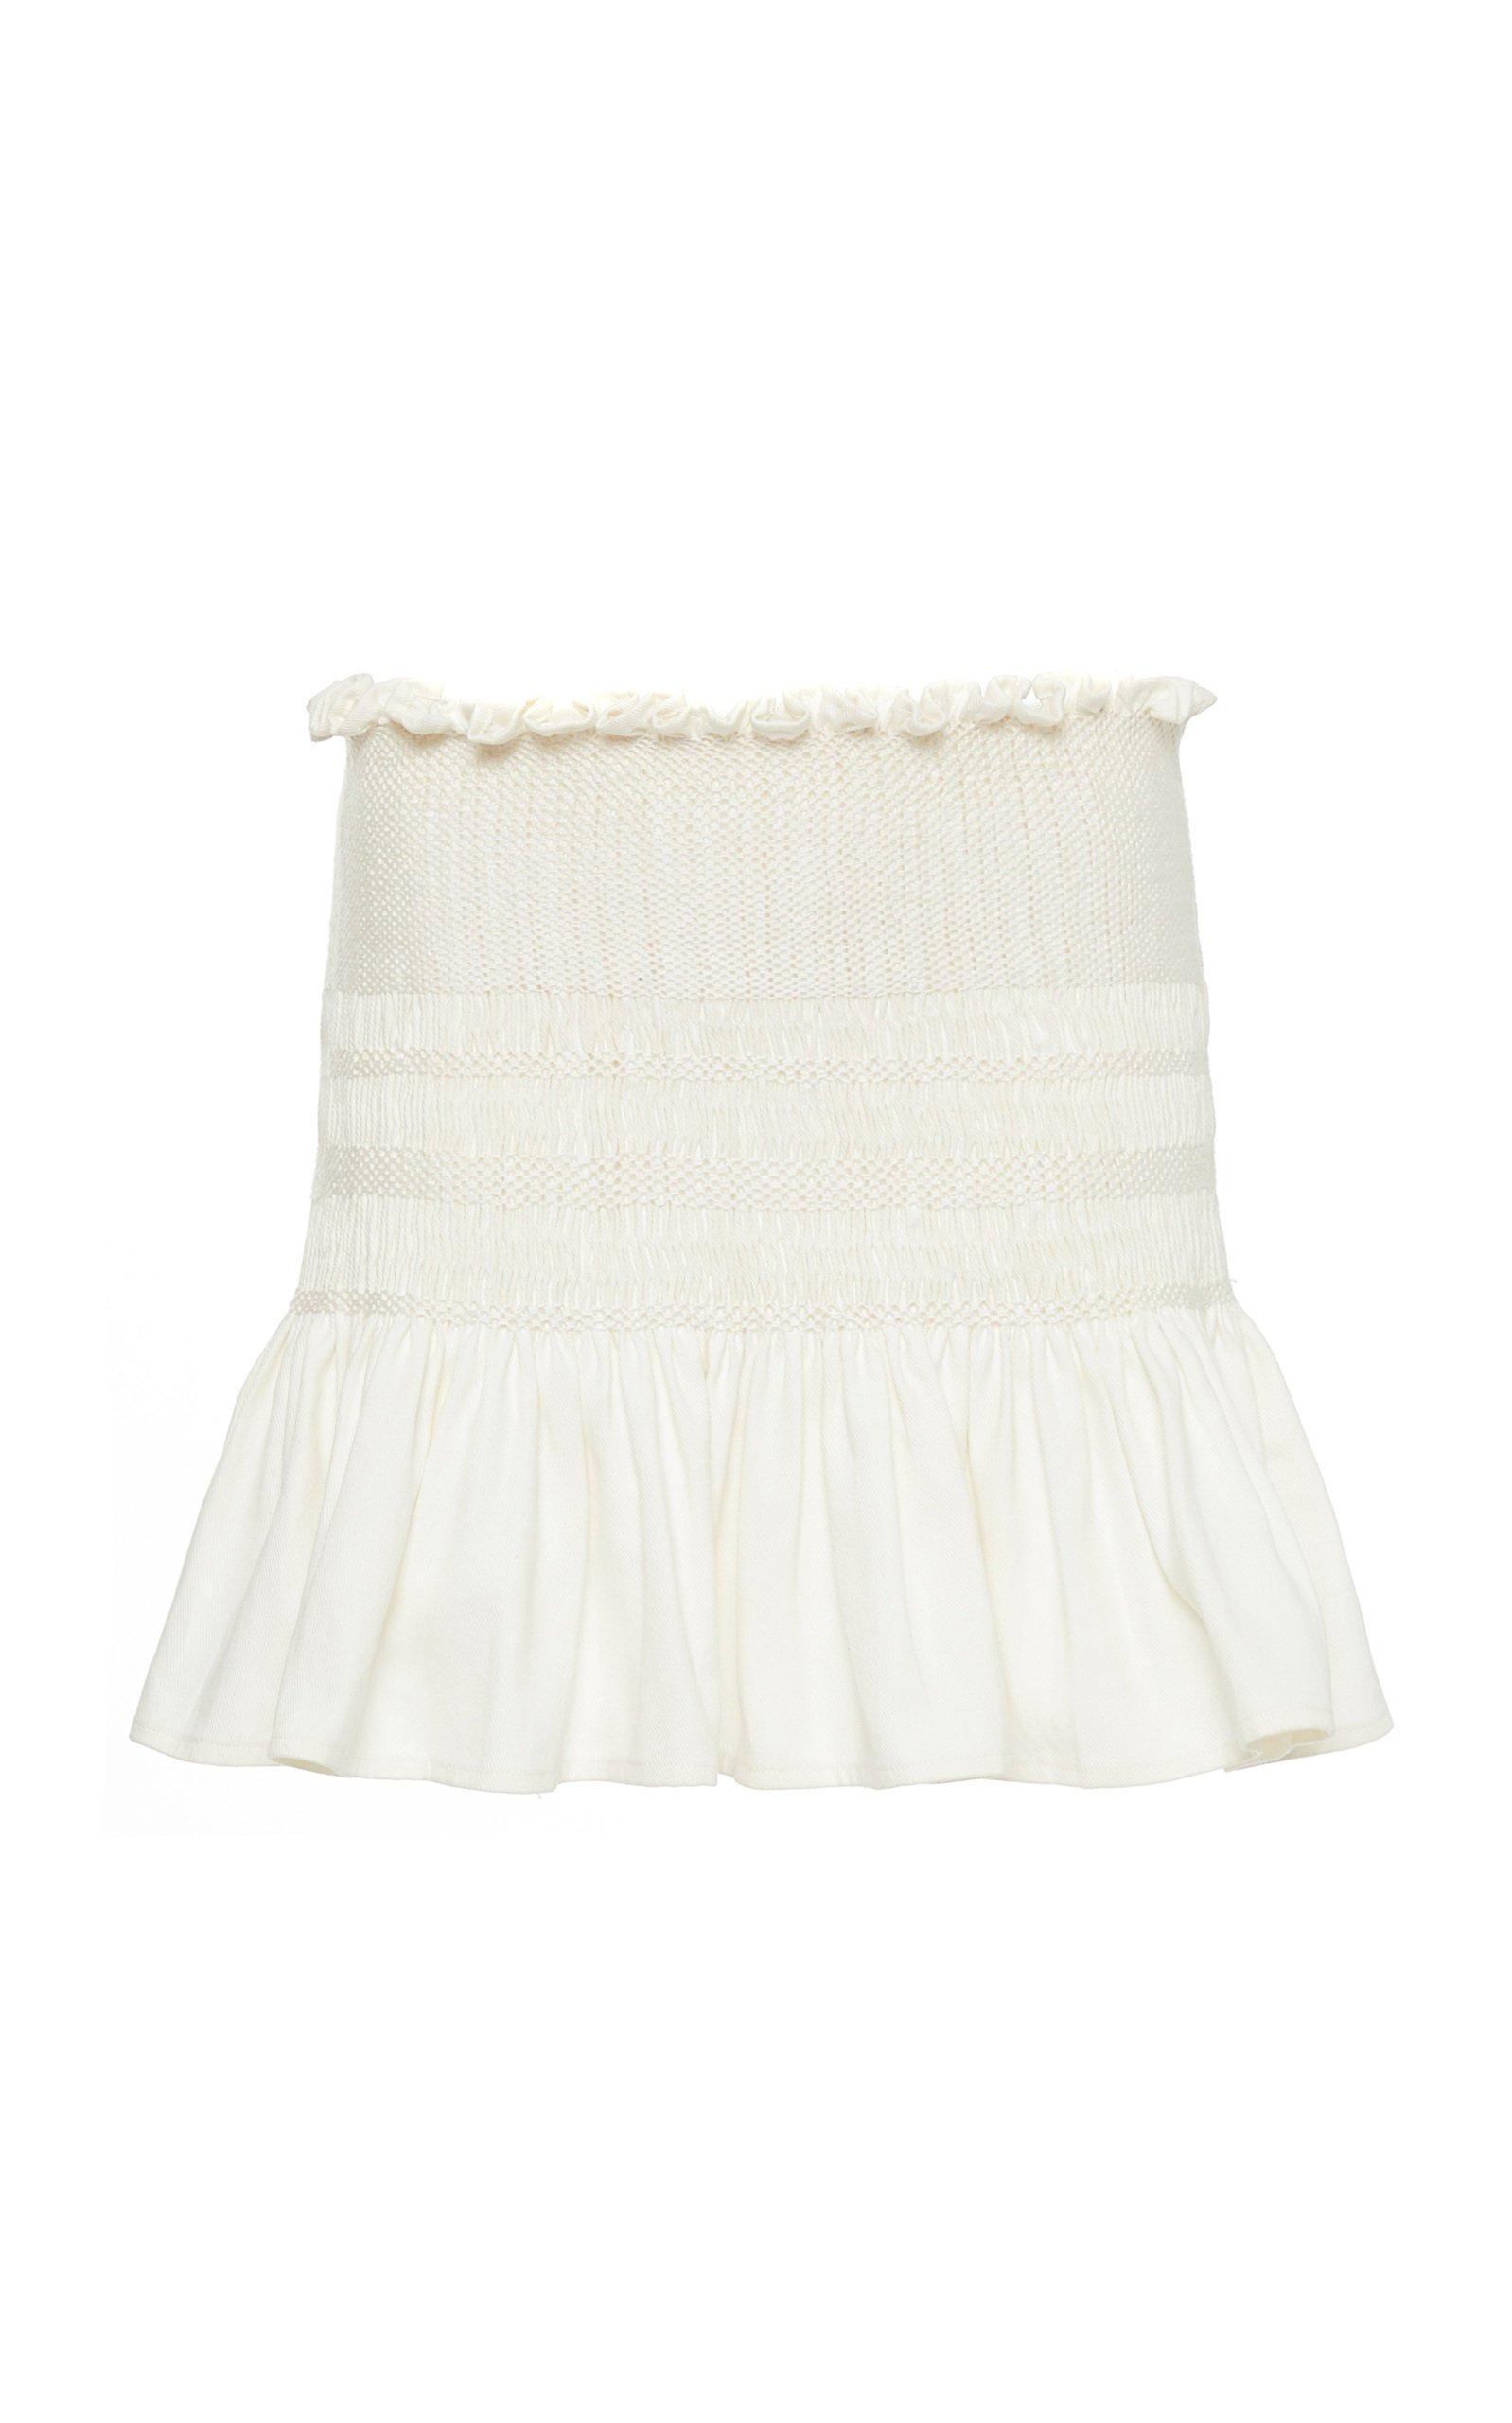 Sir The Label | Arlo mini skirt